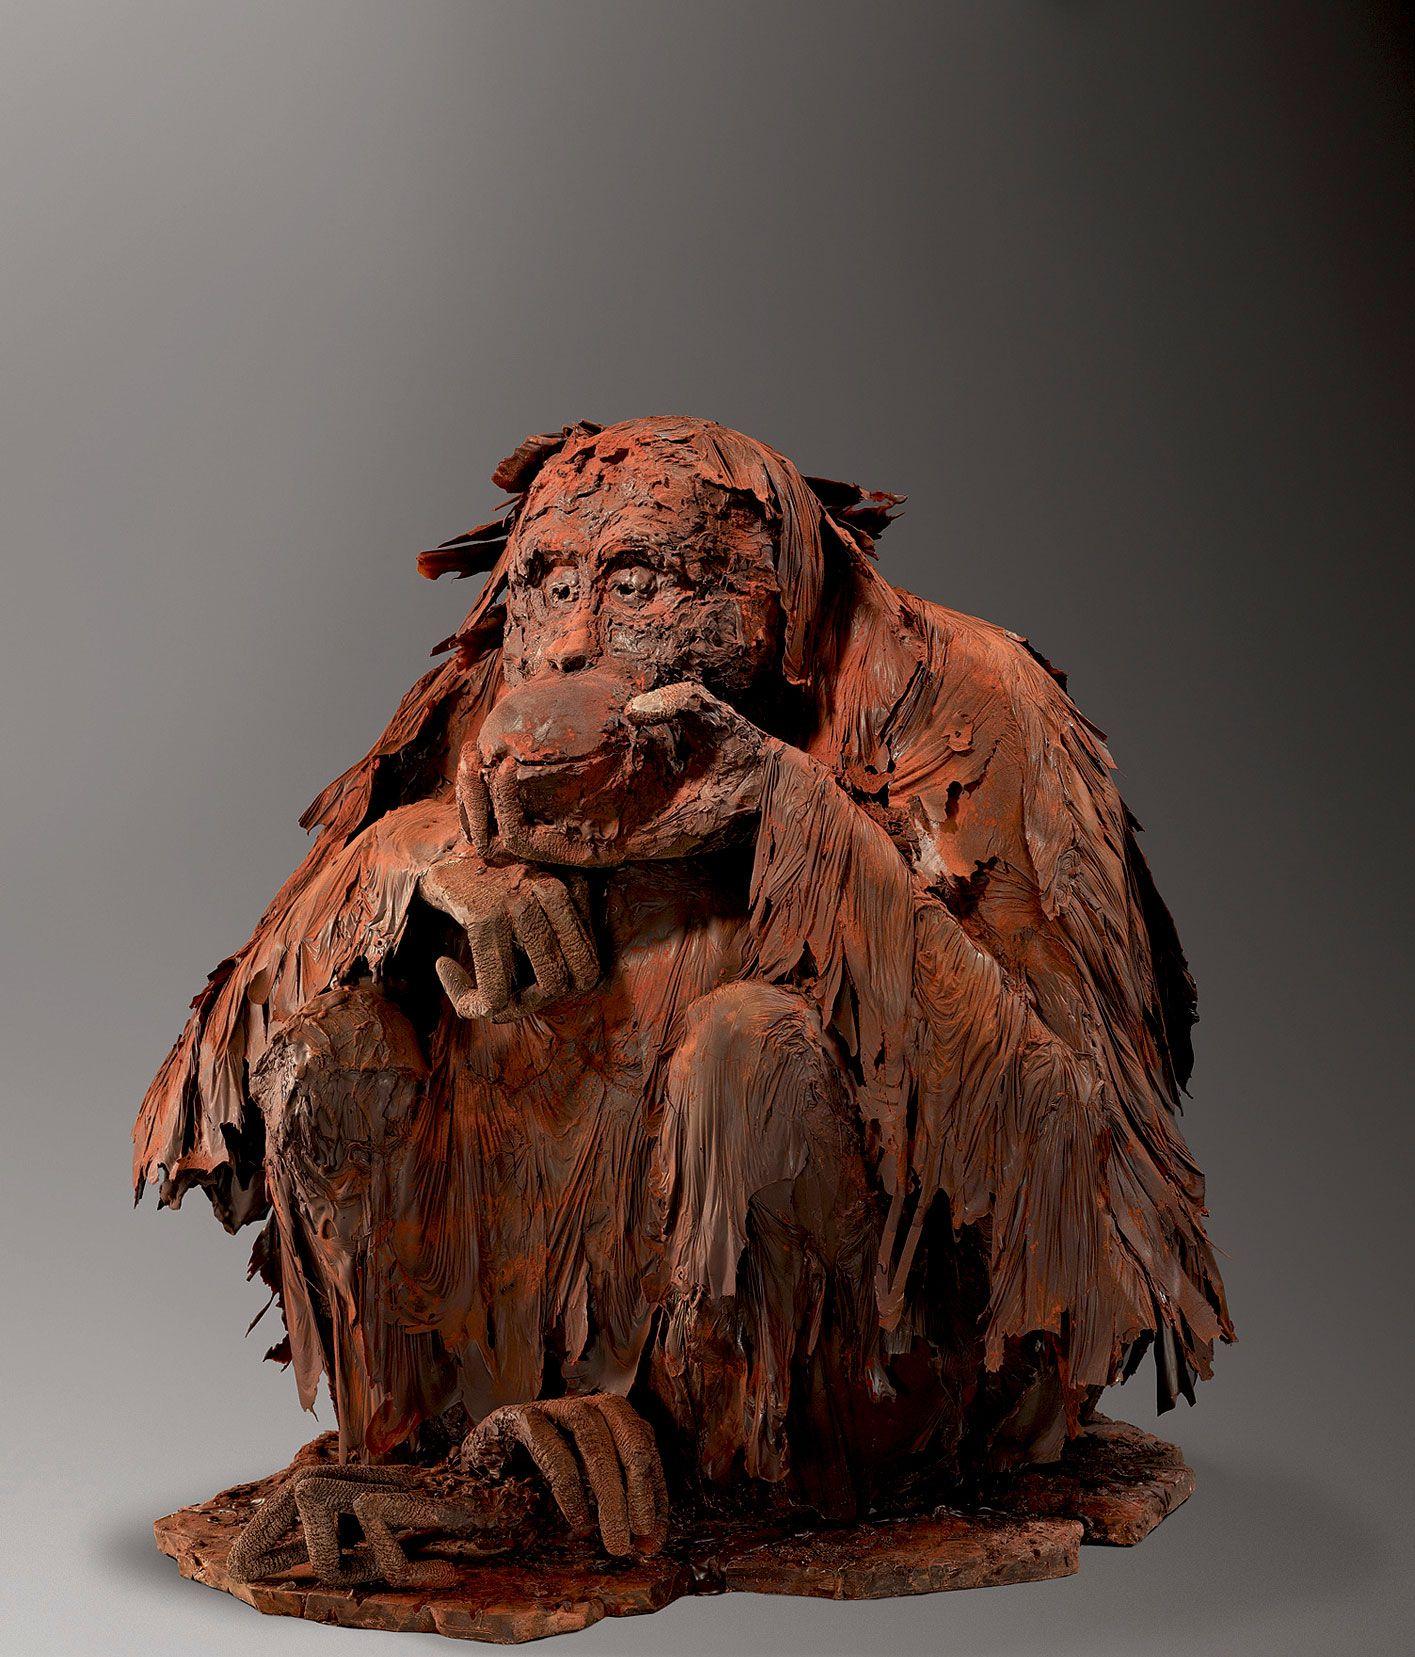 patrick roger chocolatier sculpteur rp by. Black Bedroom Furniture Sets. Home Design Ideas